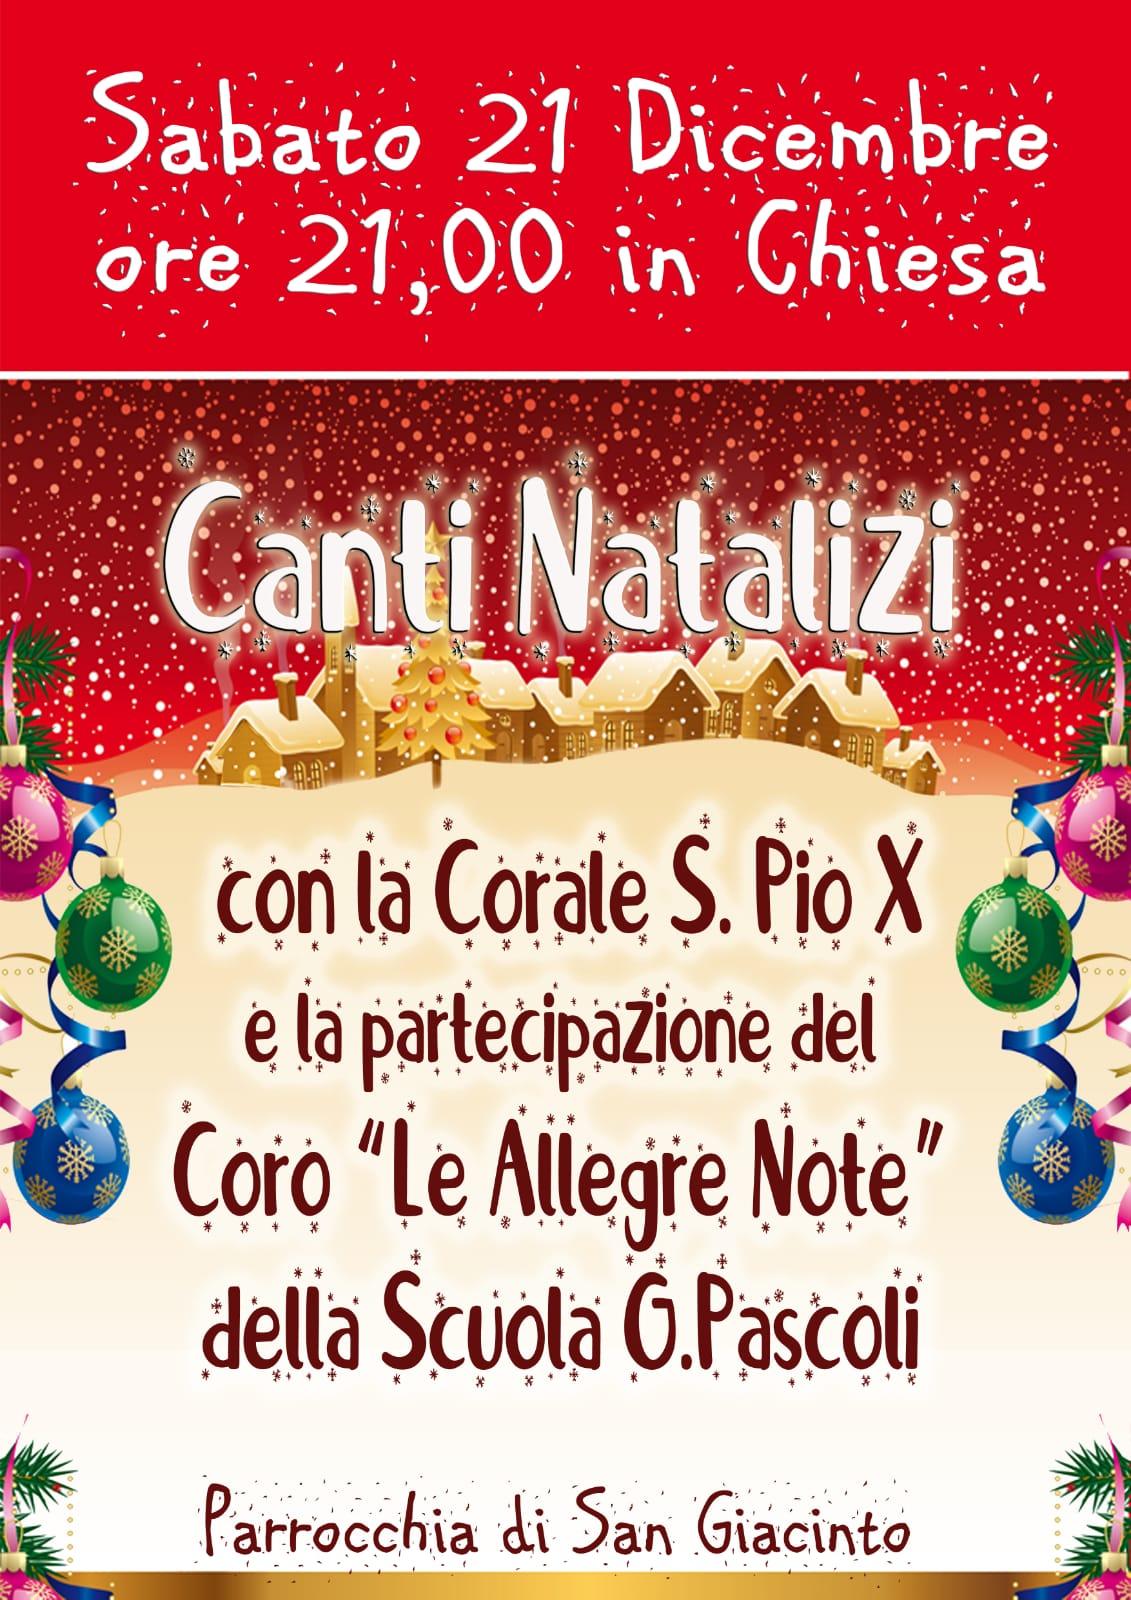 CANTI NATALIZI @ Chiesa di San Giacinto